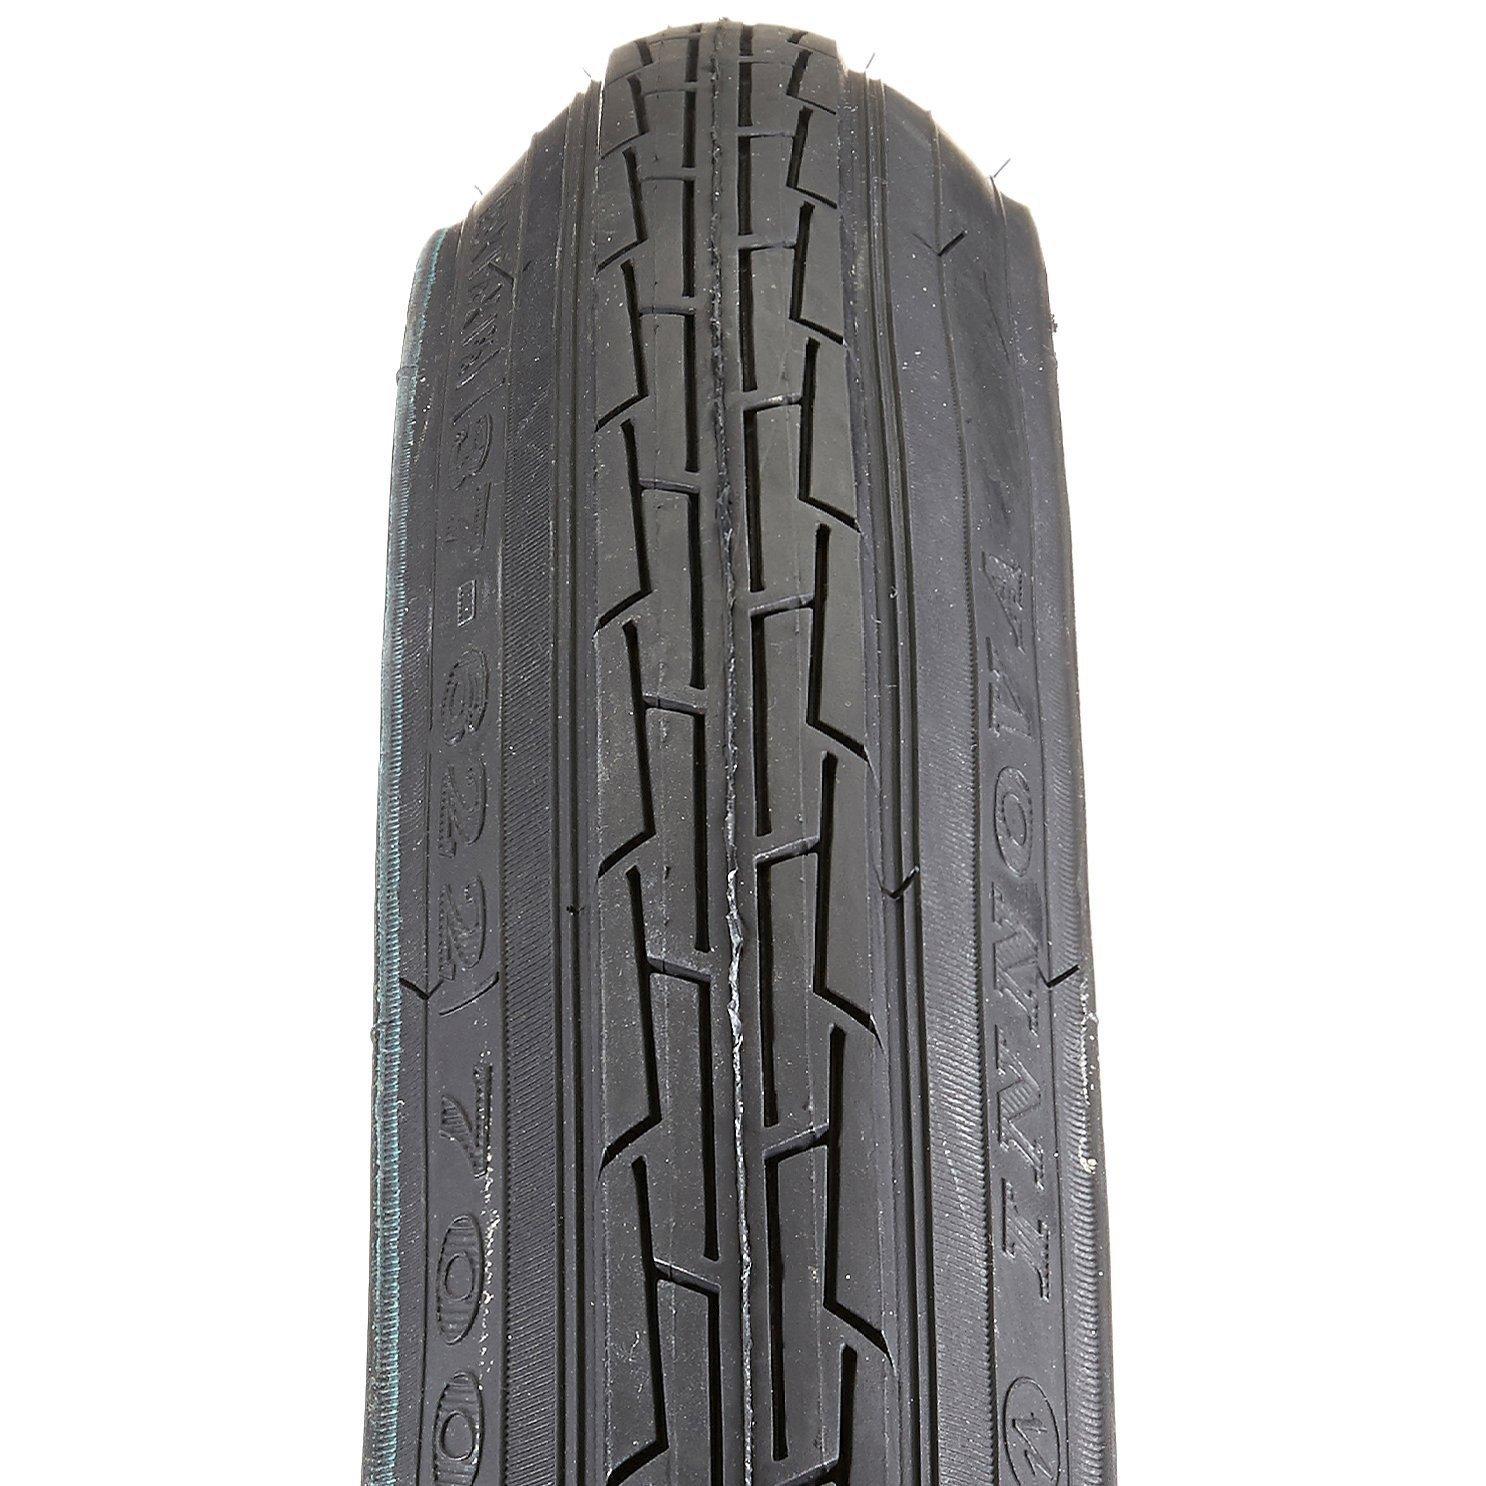 Display product reviews for Bell 700c Inertia Road Bike Tire